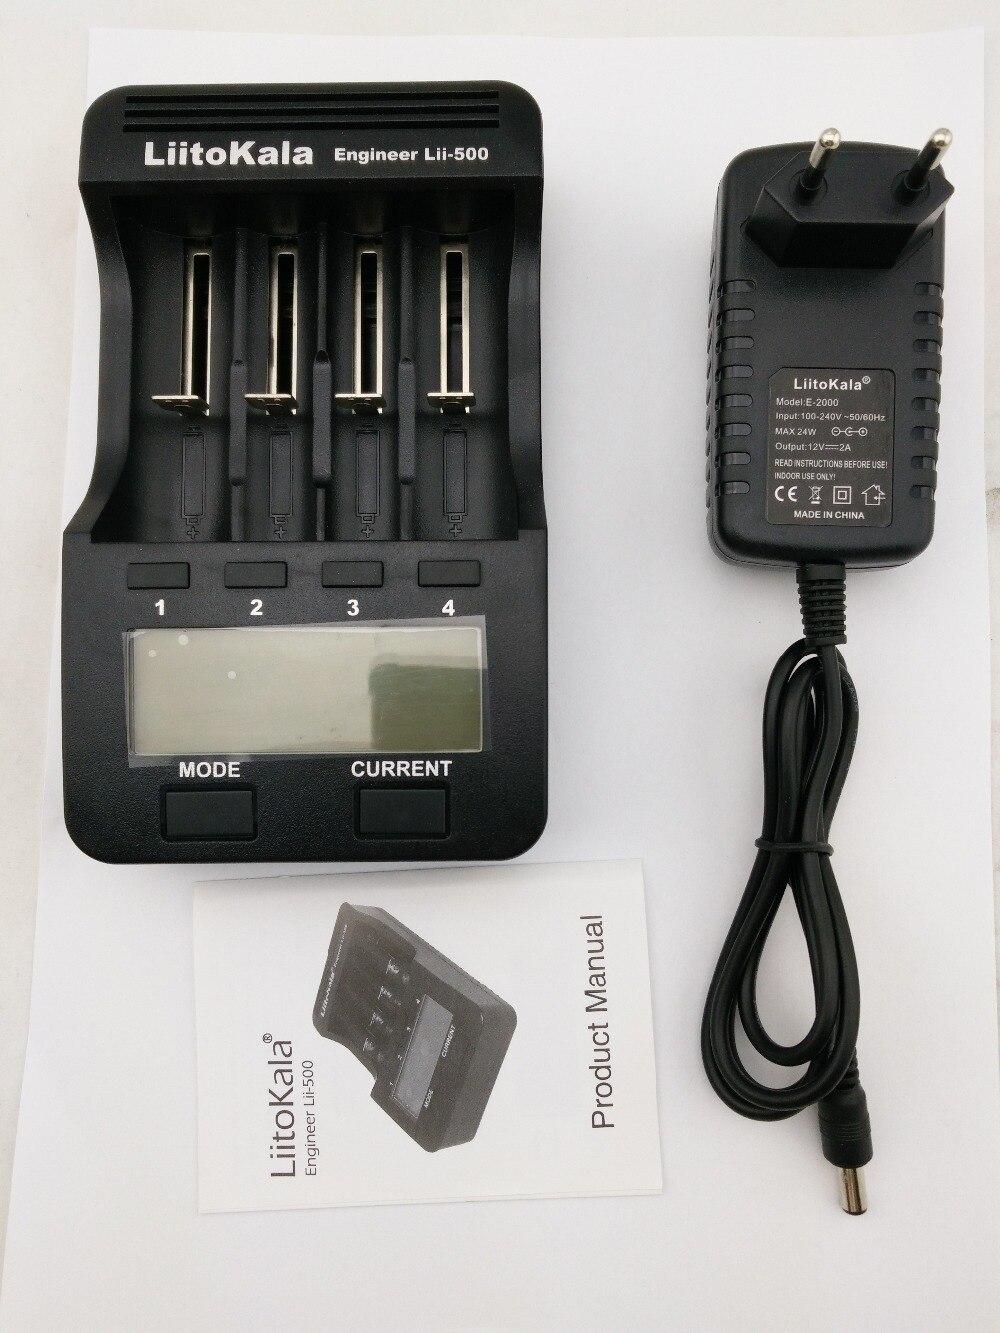 Liitokala lii500 LCD 3.7V/1.2V AA/AAA 18650/26650/16340/14500/10440/18500 Battery Charger with screen+12V2A adapter lii-500 5V1A